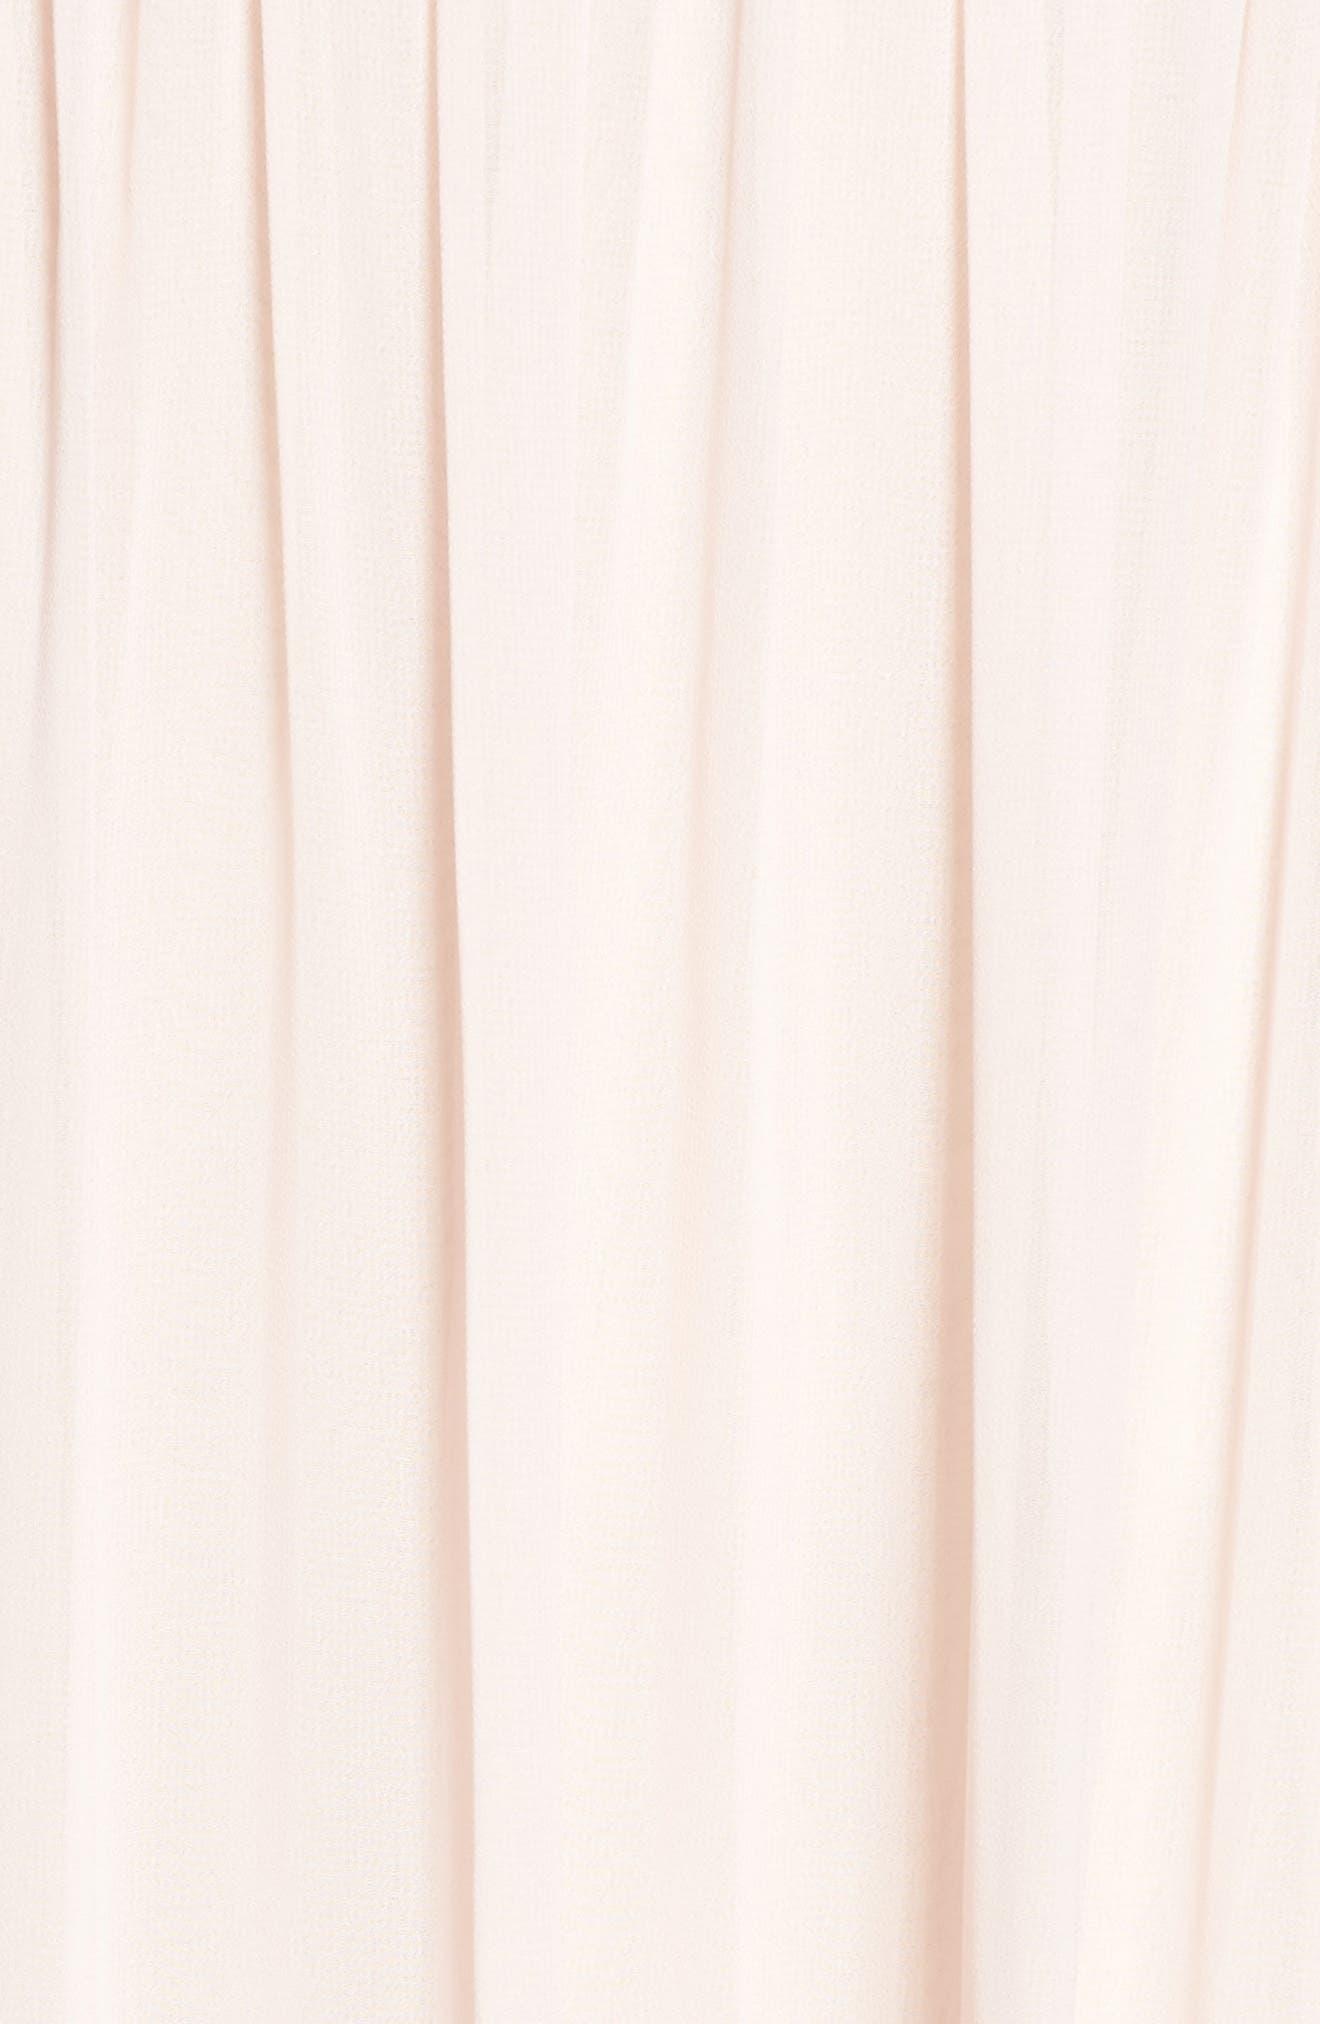 Ruffle Detail A-Line Chiffon Gown,                             Alternate thumbnail 5, color,                             Blush Cashmere